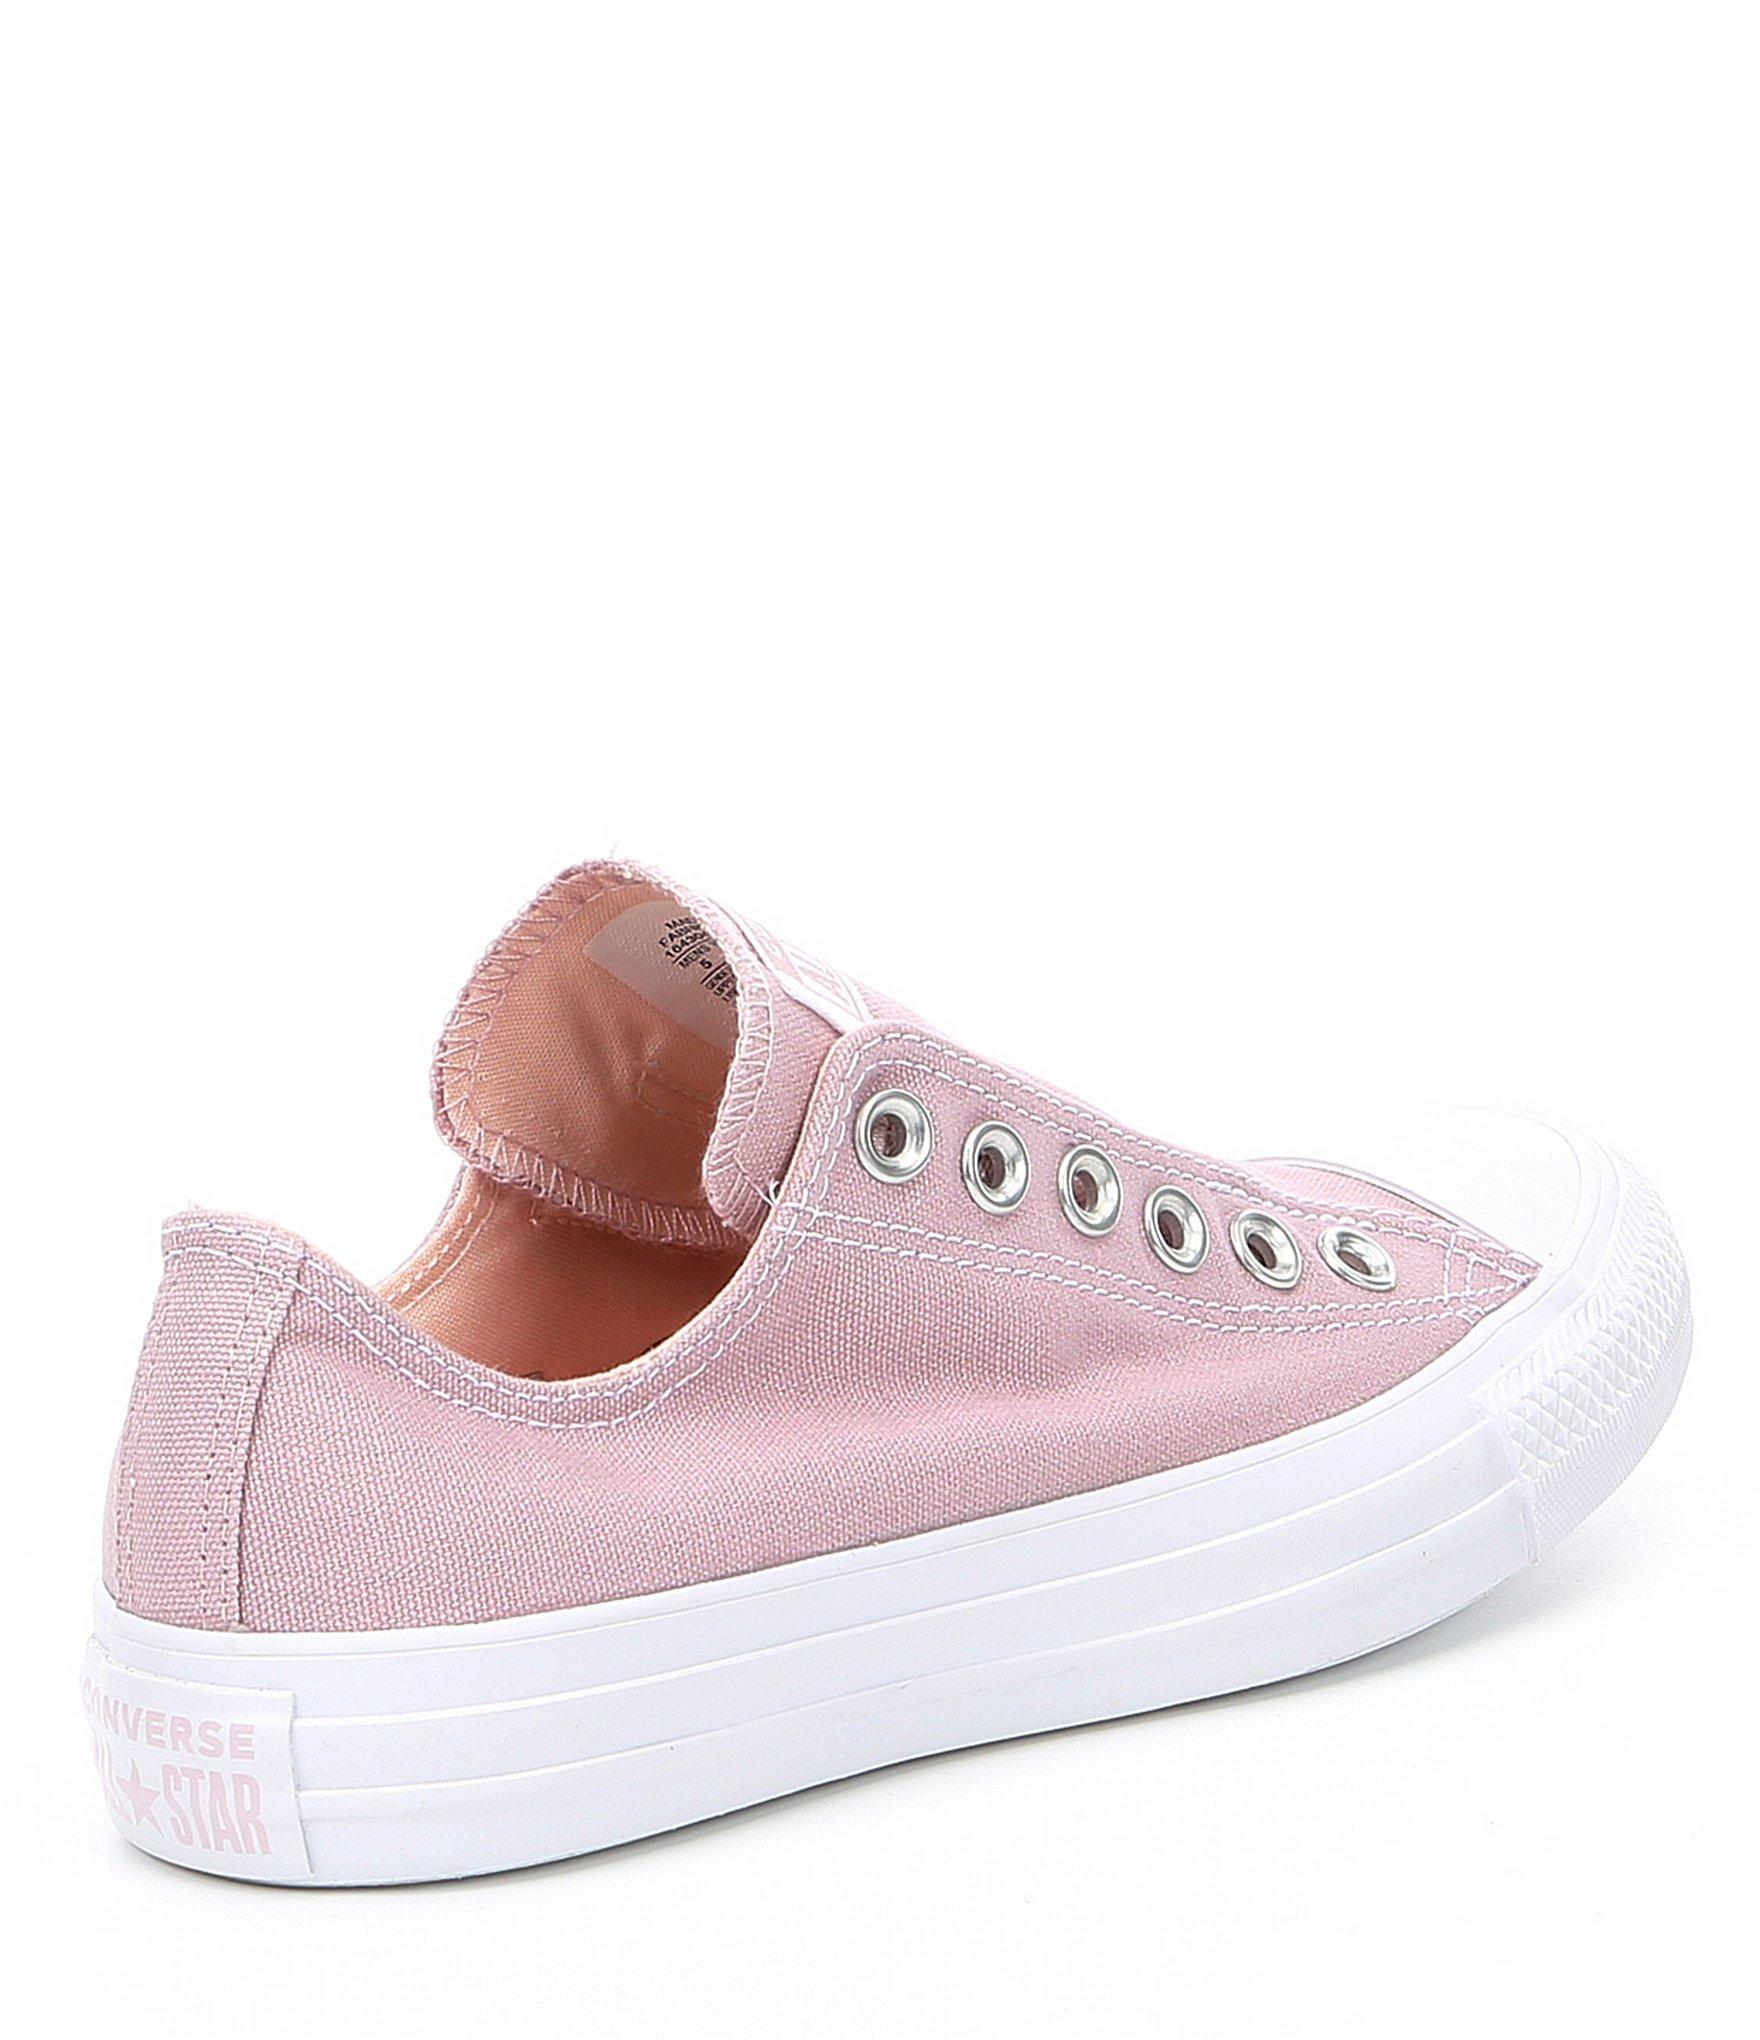 2f930645d00d Converse - Pink Women s Chuck Taylor All Star Boardwalk Summers Slip On  Sneakers - Lyst. View fullscreen